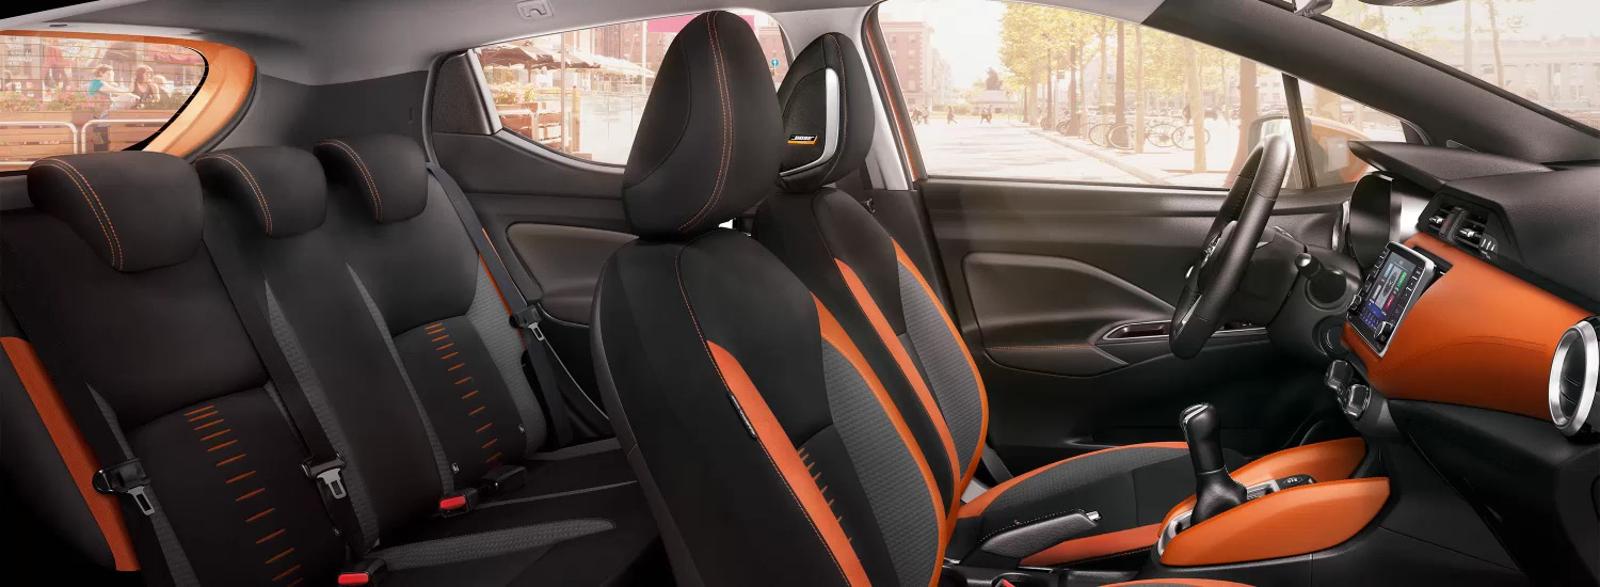 Interior Nissan Micra negro y naranja